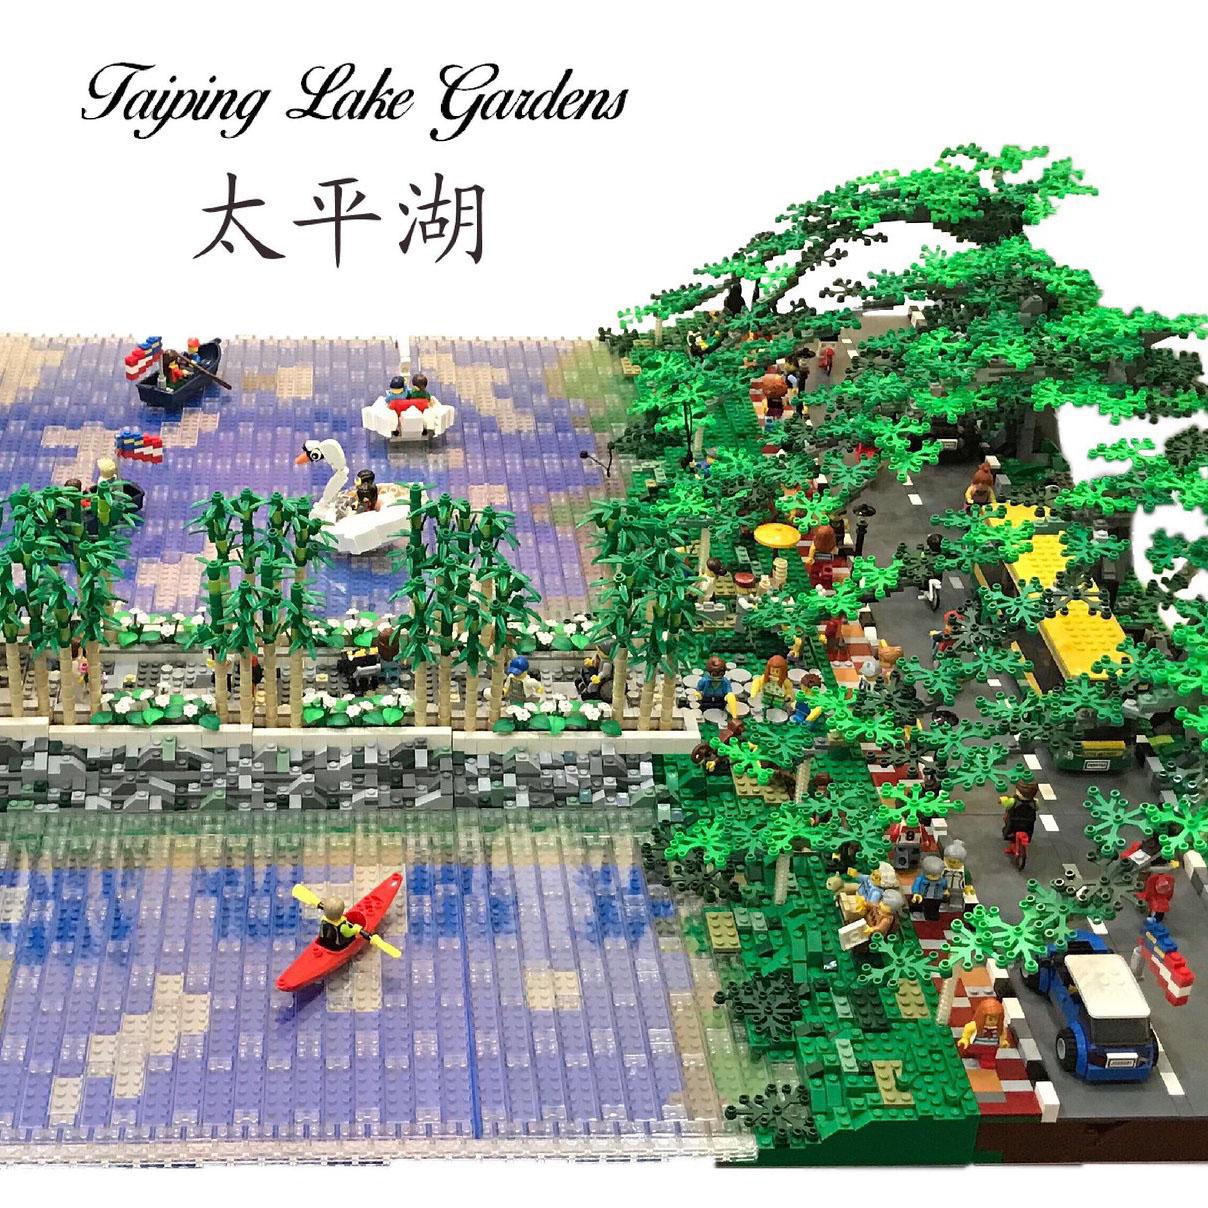 Lego Model of Lake Gardens of Taiping